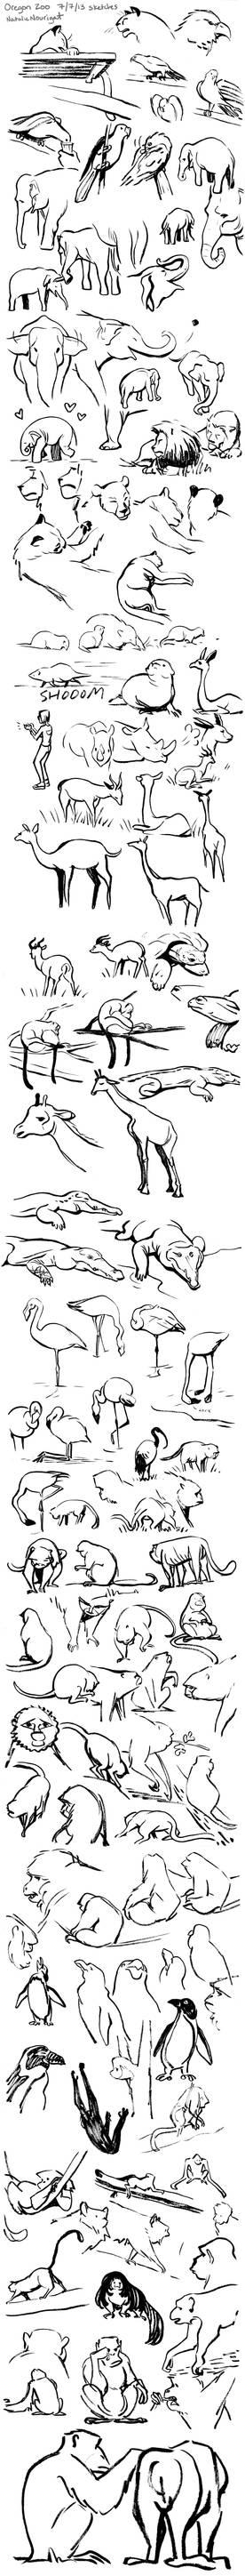 Oregon Zoo sketches 7.7.13